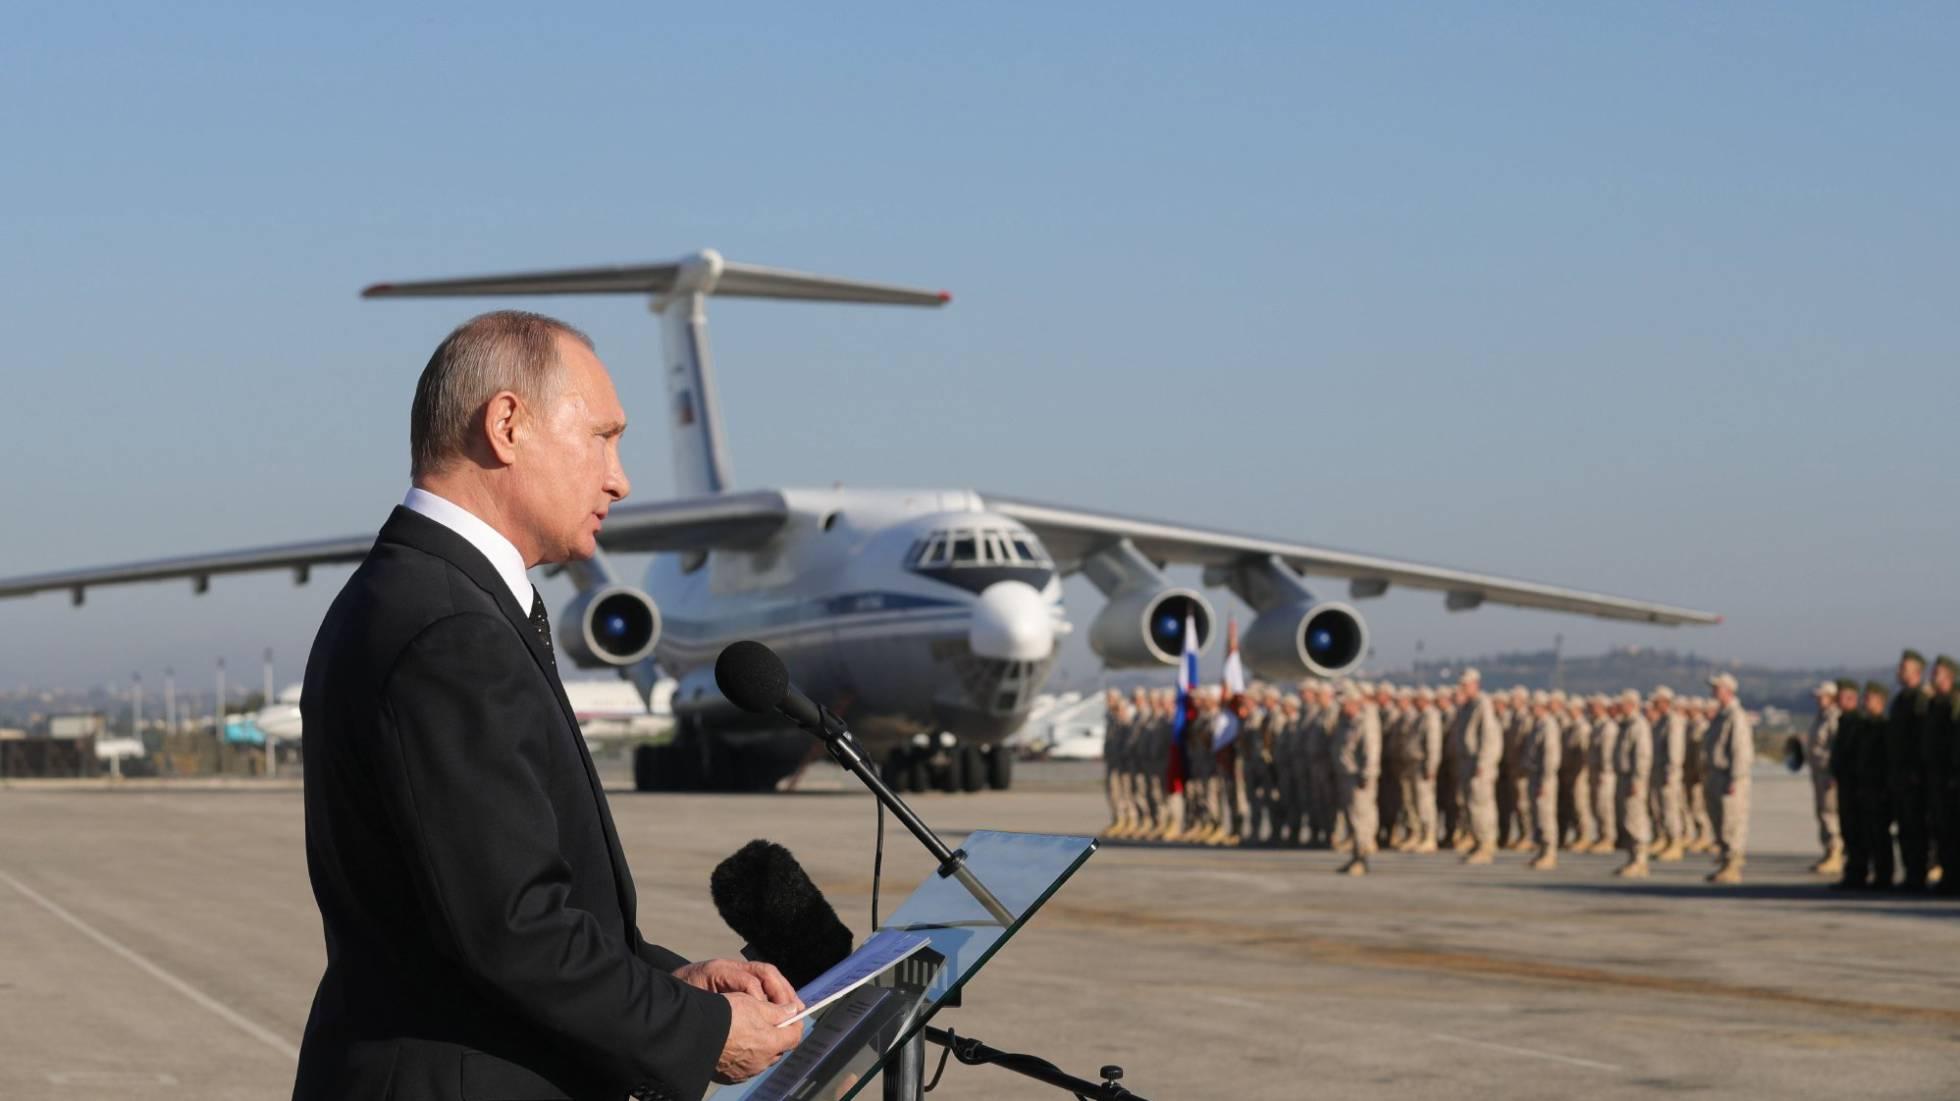 Un avión militar ruso con 39 personas a bordo se estrella en Siria